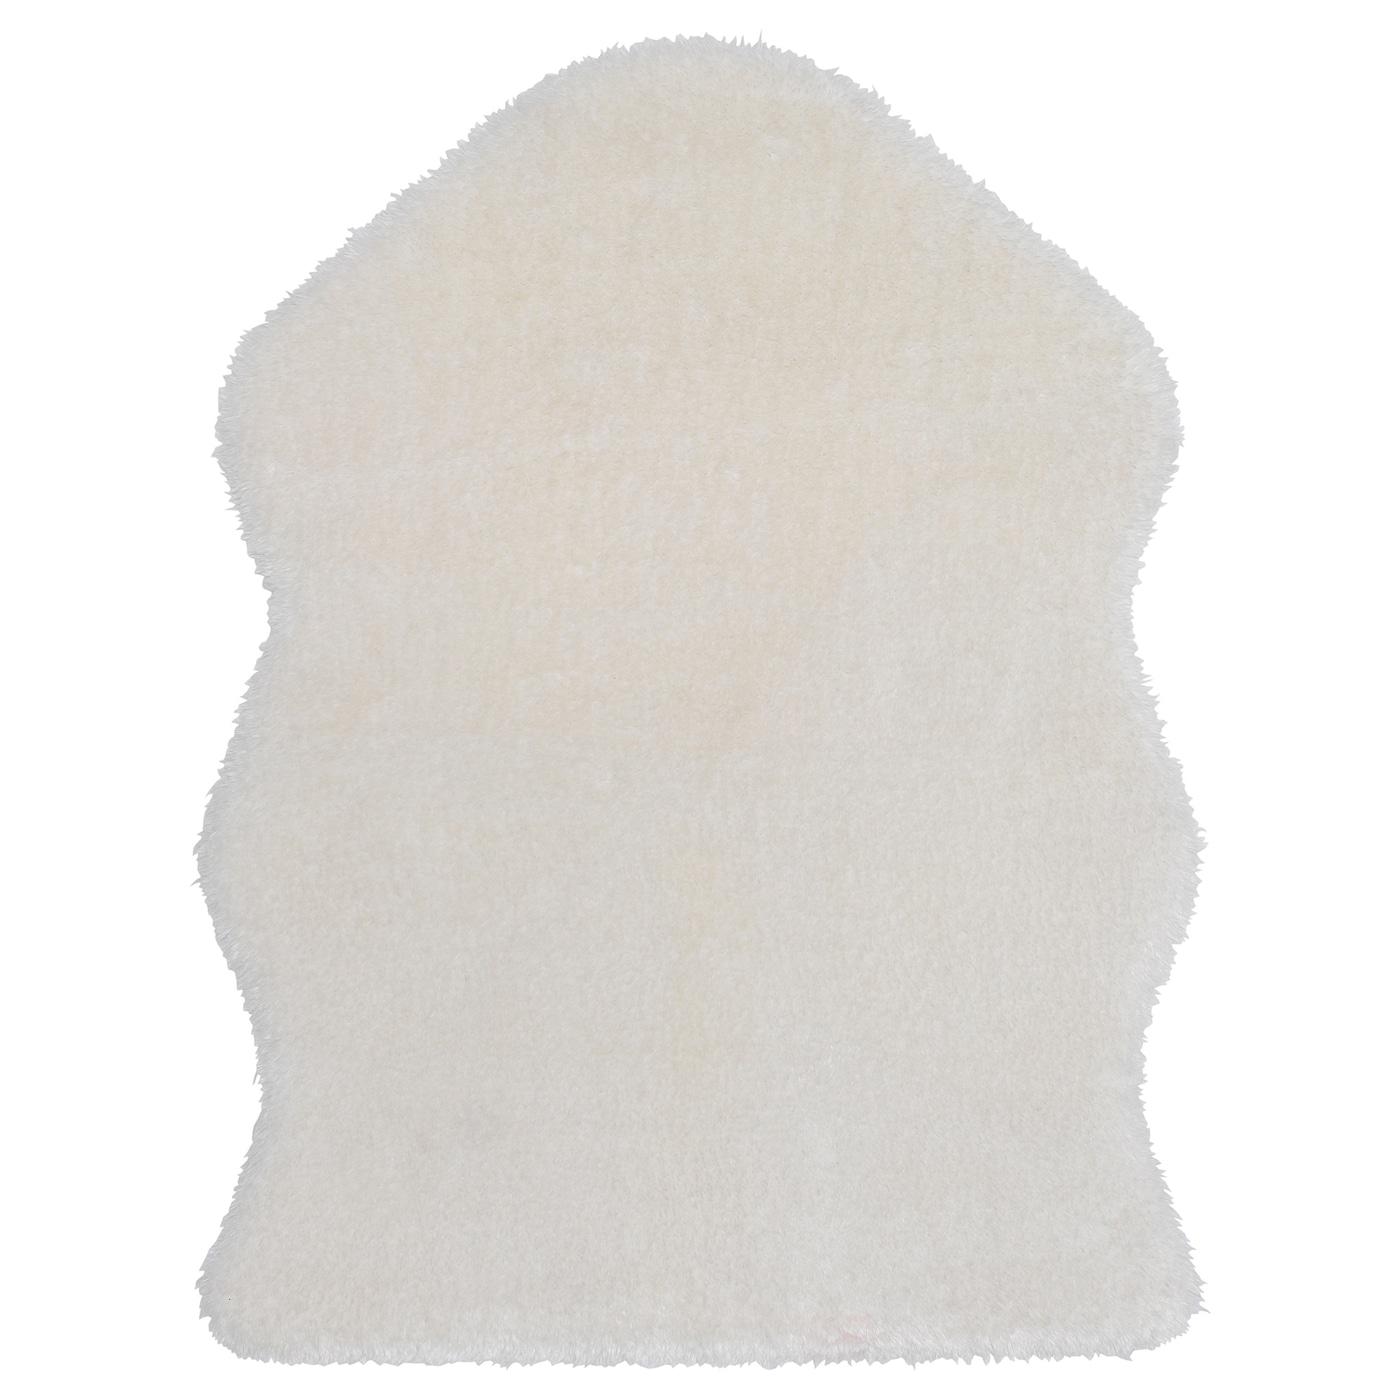 toftlund tapis blanc 2 11 x4 11 90x150 cm